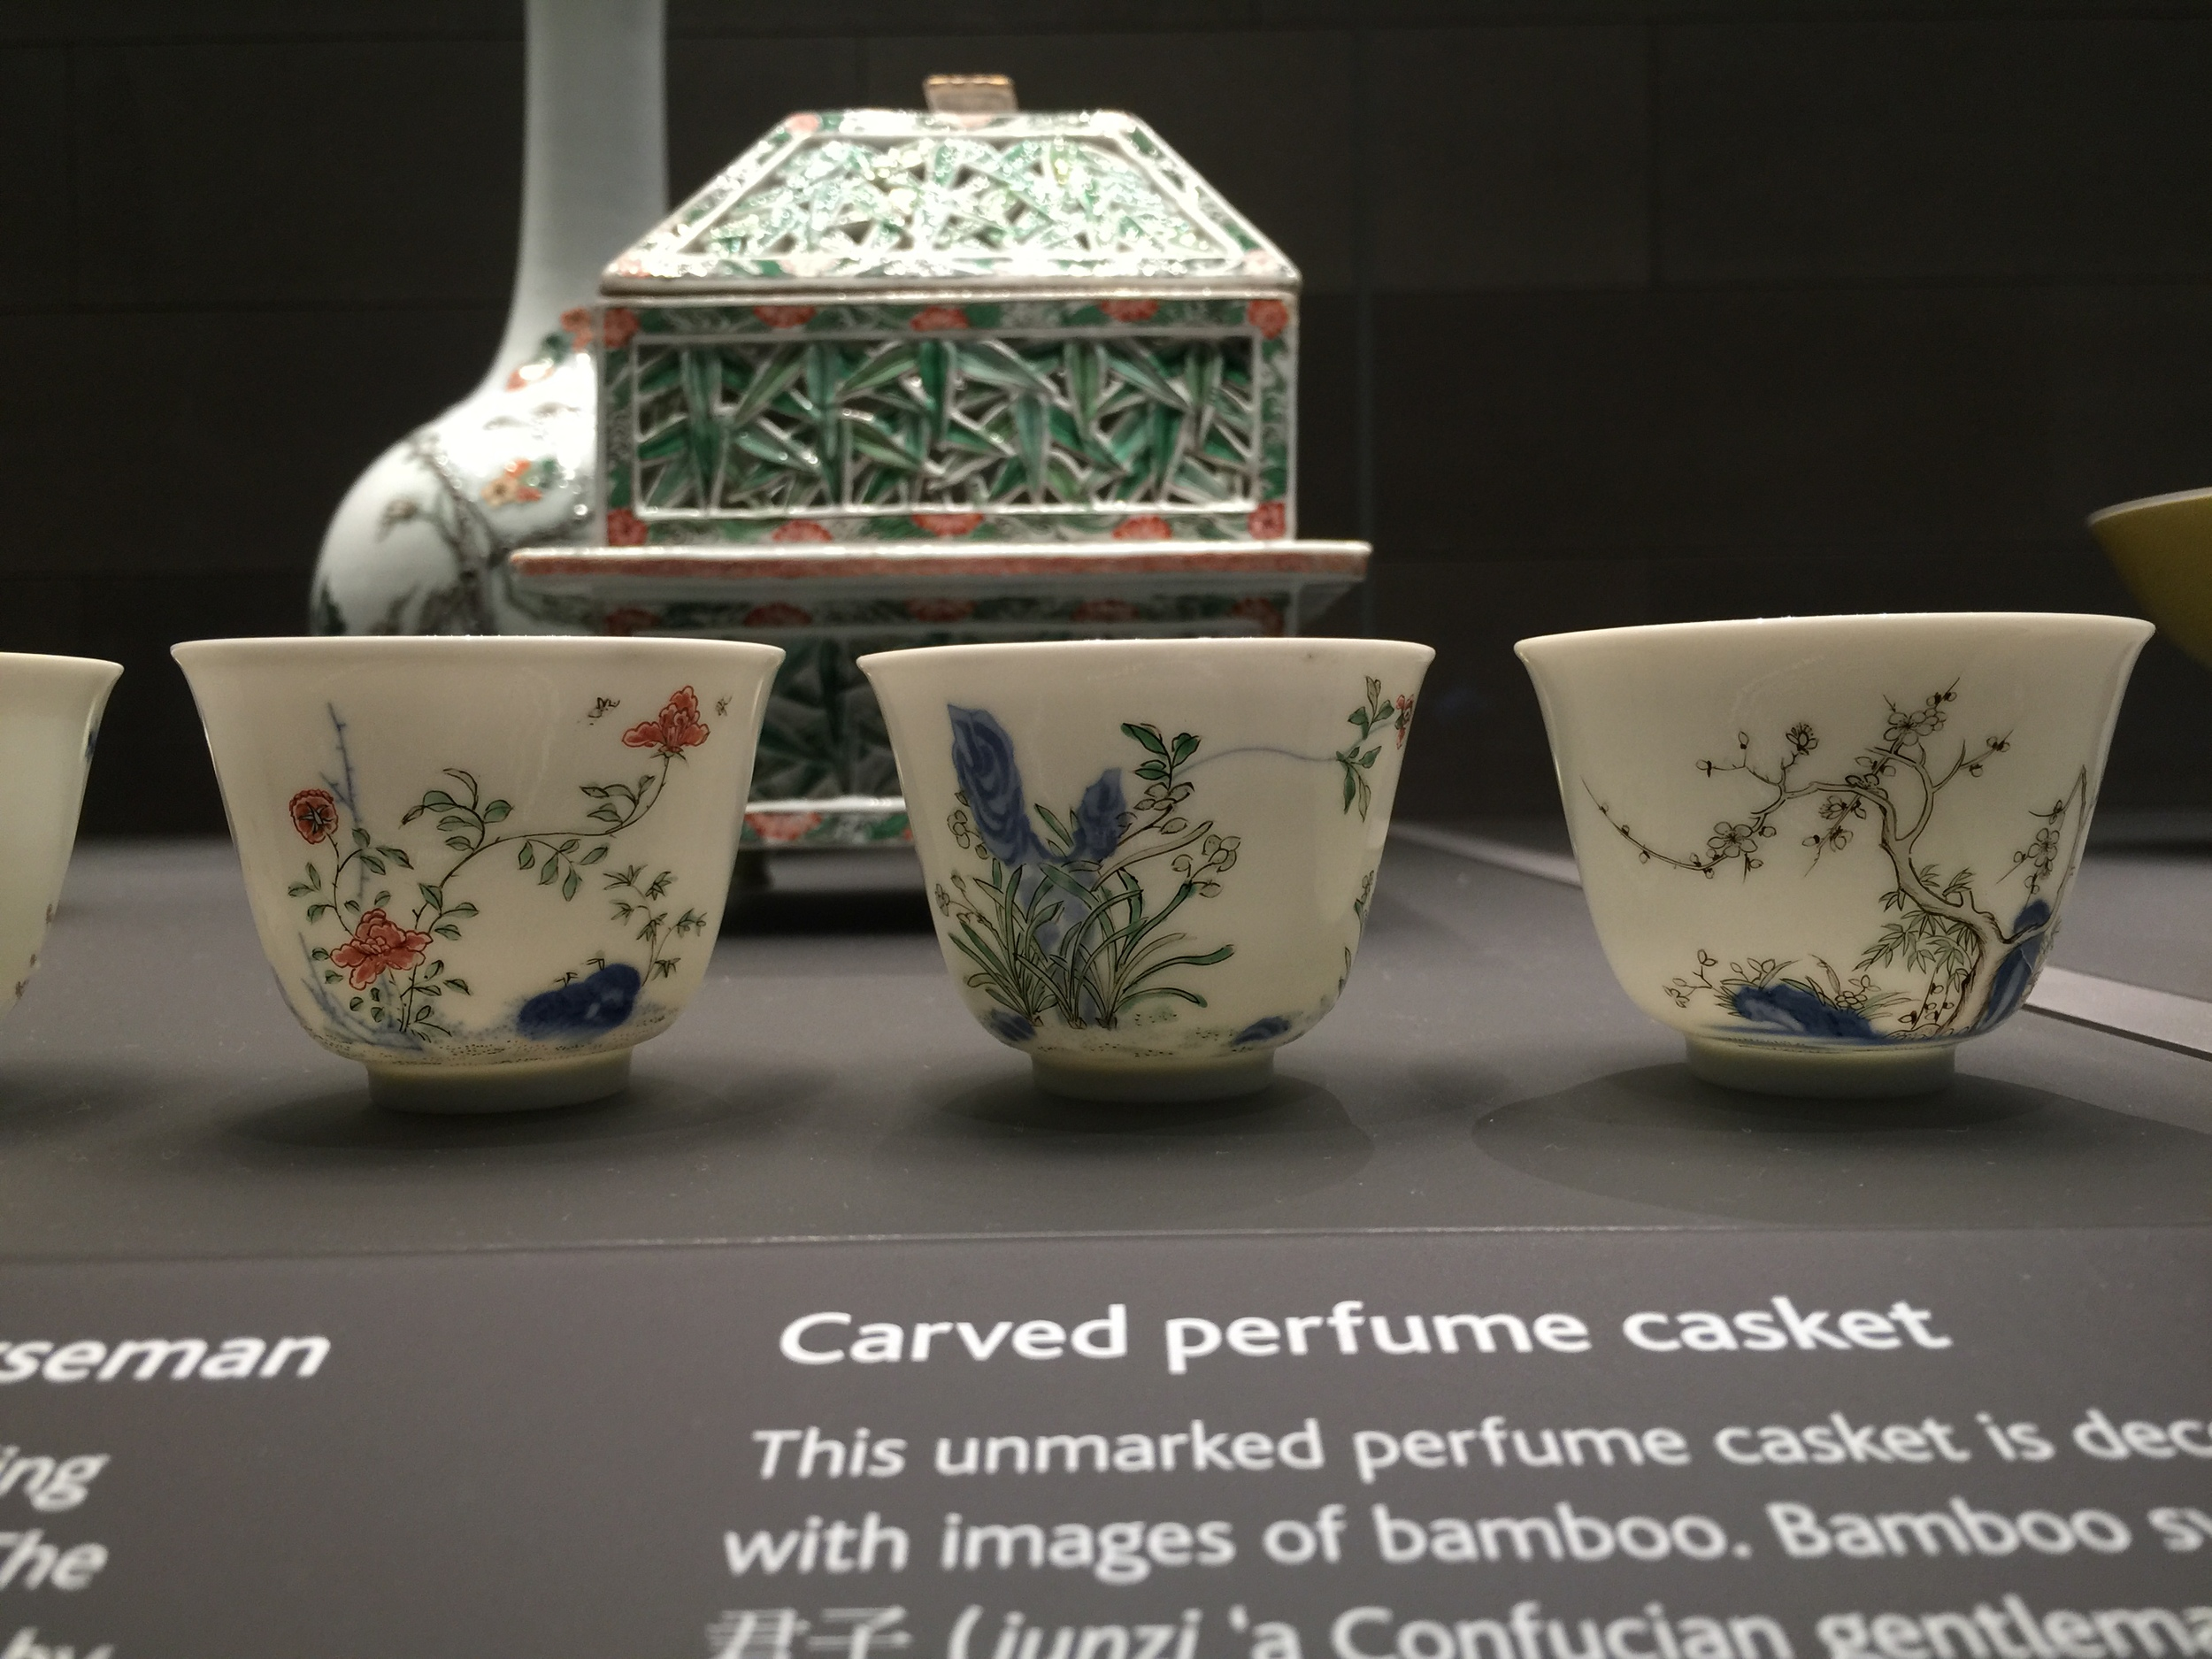 Chinese-Porcelain-British-Museum-Percival-David-jessewaugh.com-130.jpg